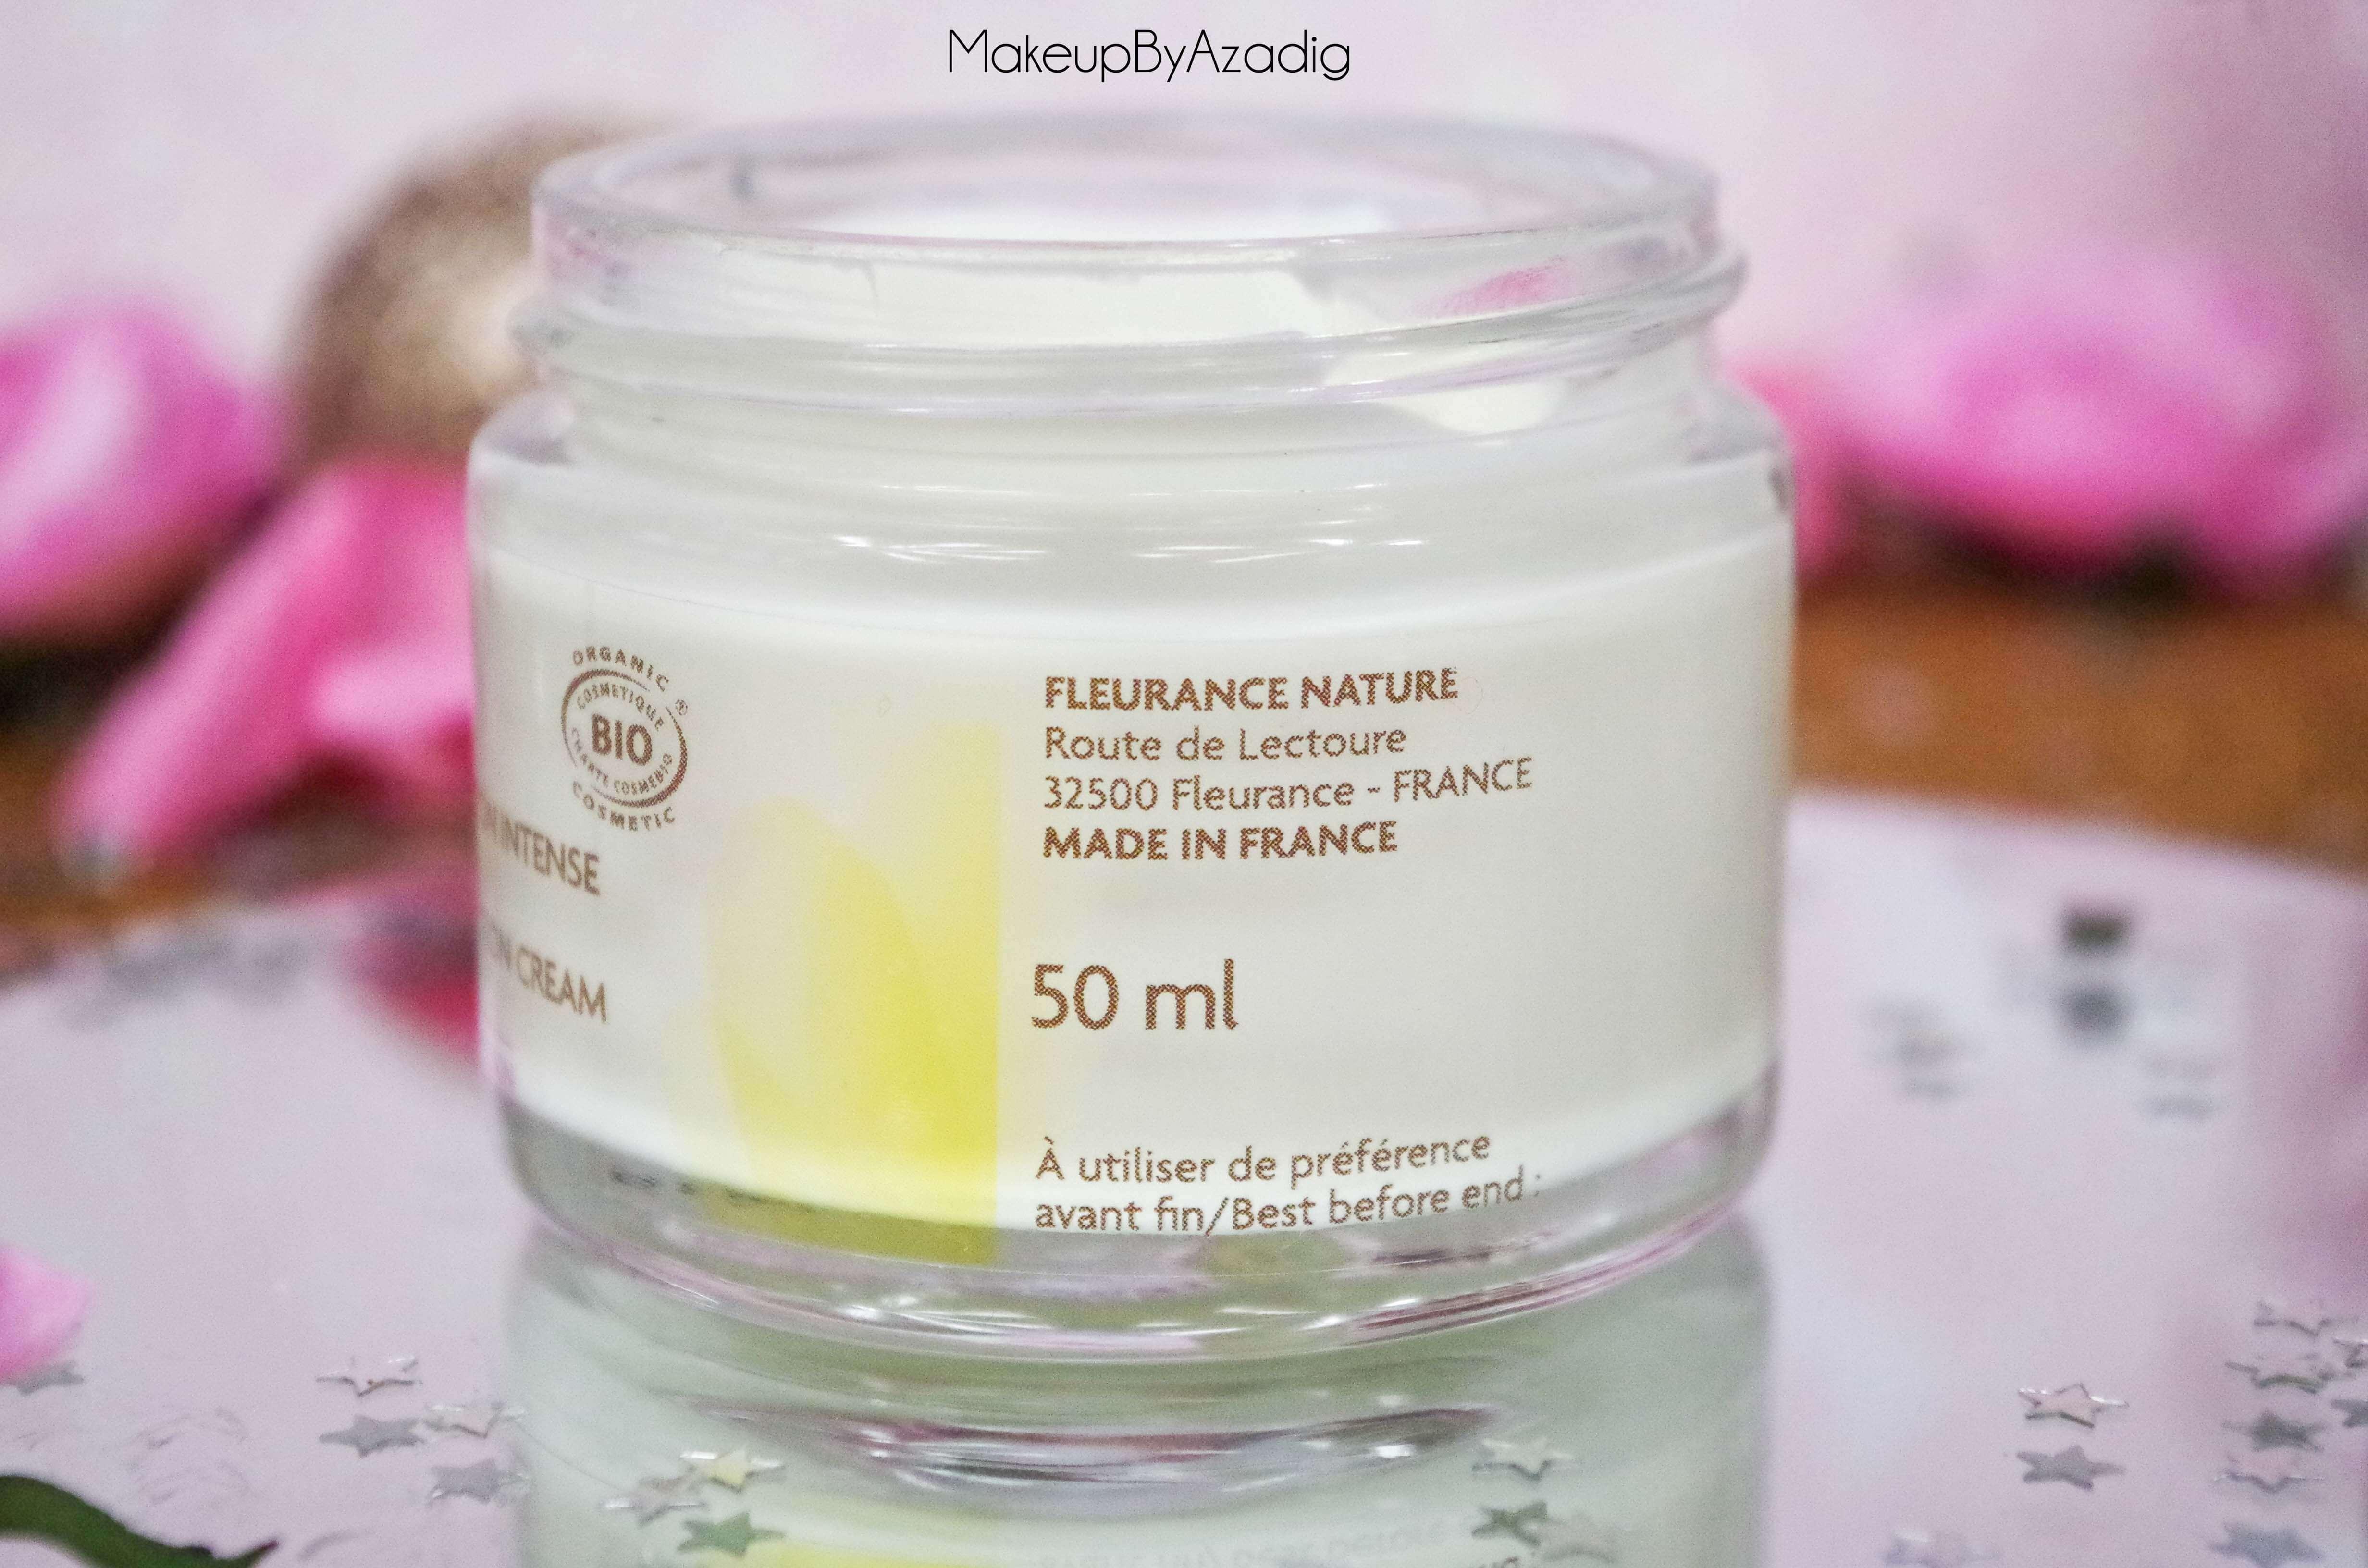 creme-nutrition-intense-serum-nuit-fleur-immortelle-fleurance-nature-makeupbyazadig-revue-prix-avis-made-in-france